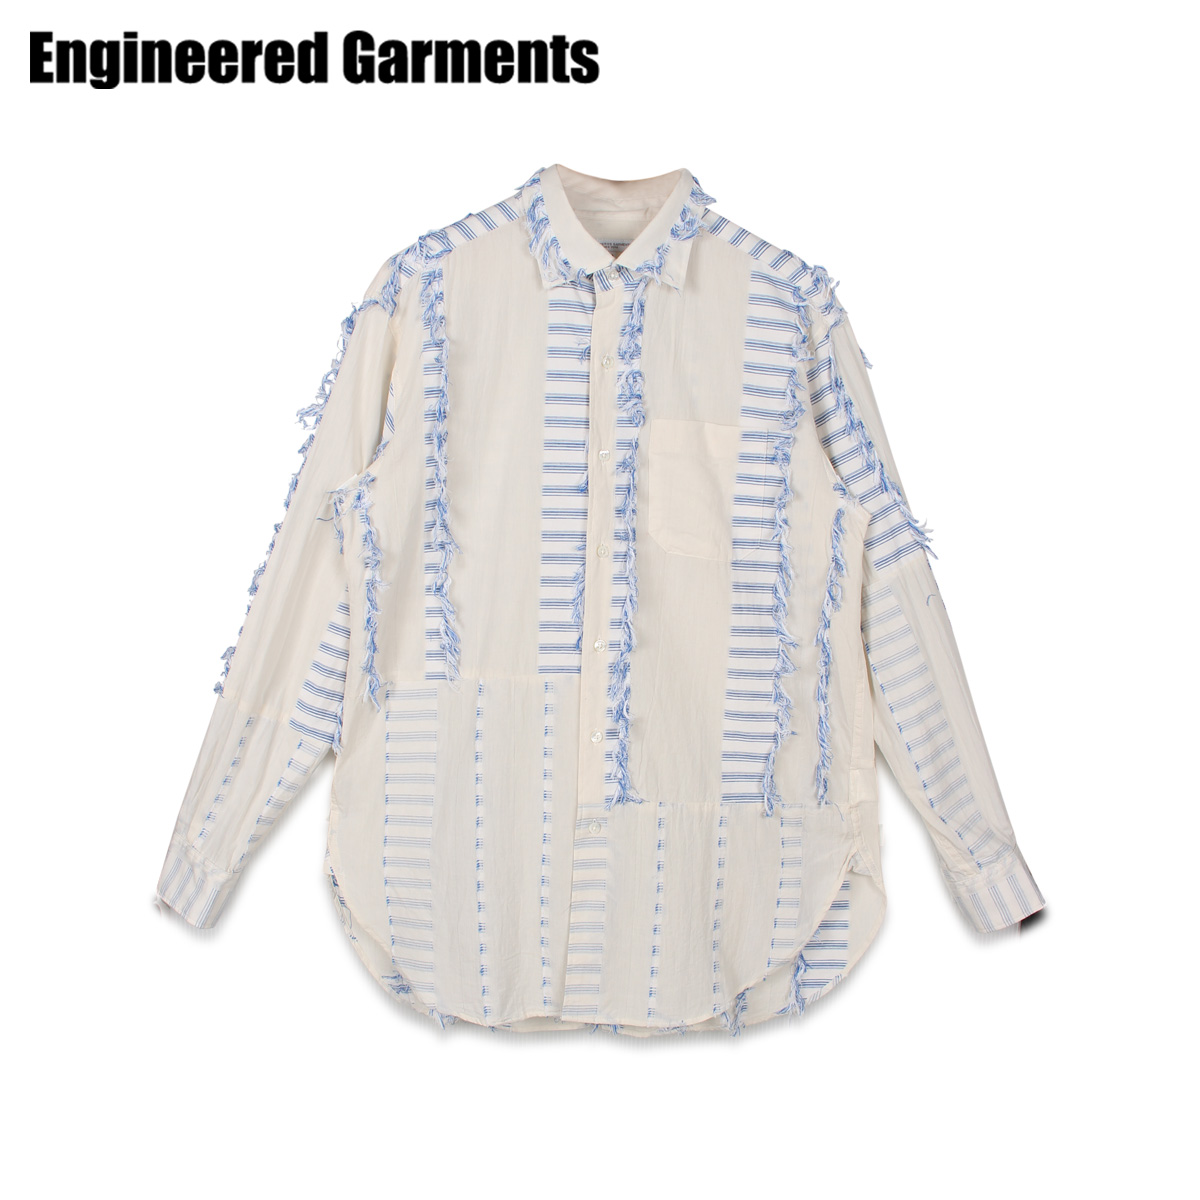 ENGINEERED GARMENTS エンジニアドガーメンツ シャツ 長袖 オックスフォードシャツ メンズ SPREAD COLLAR SHIRT ホワイト 白 20S1A013